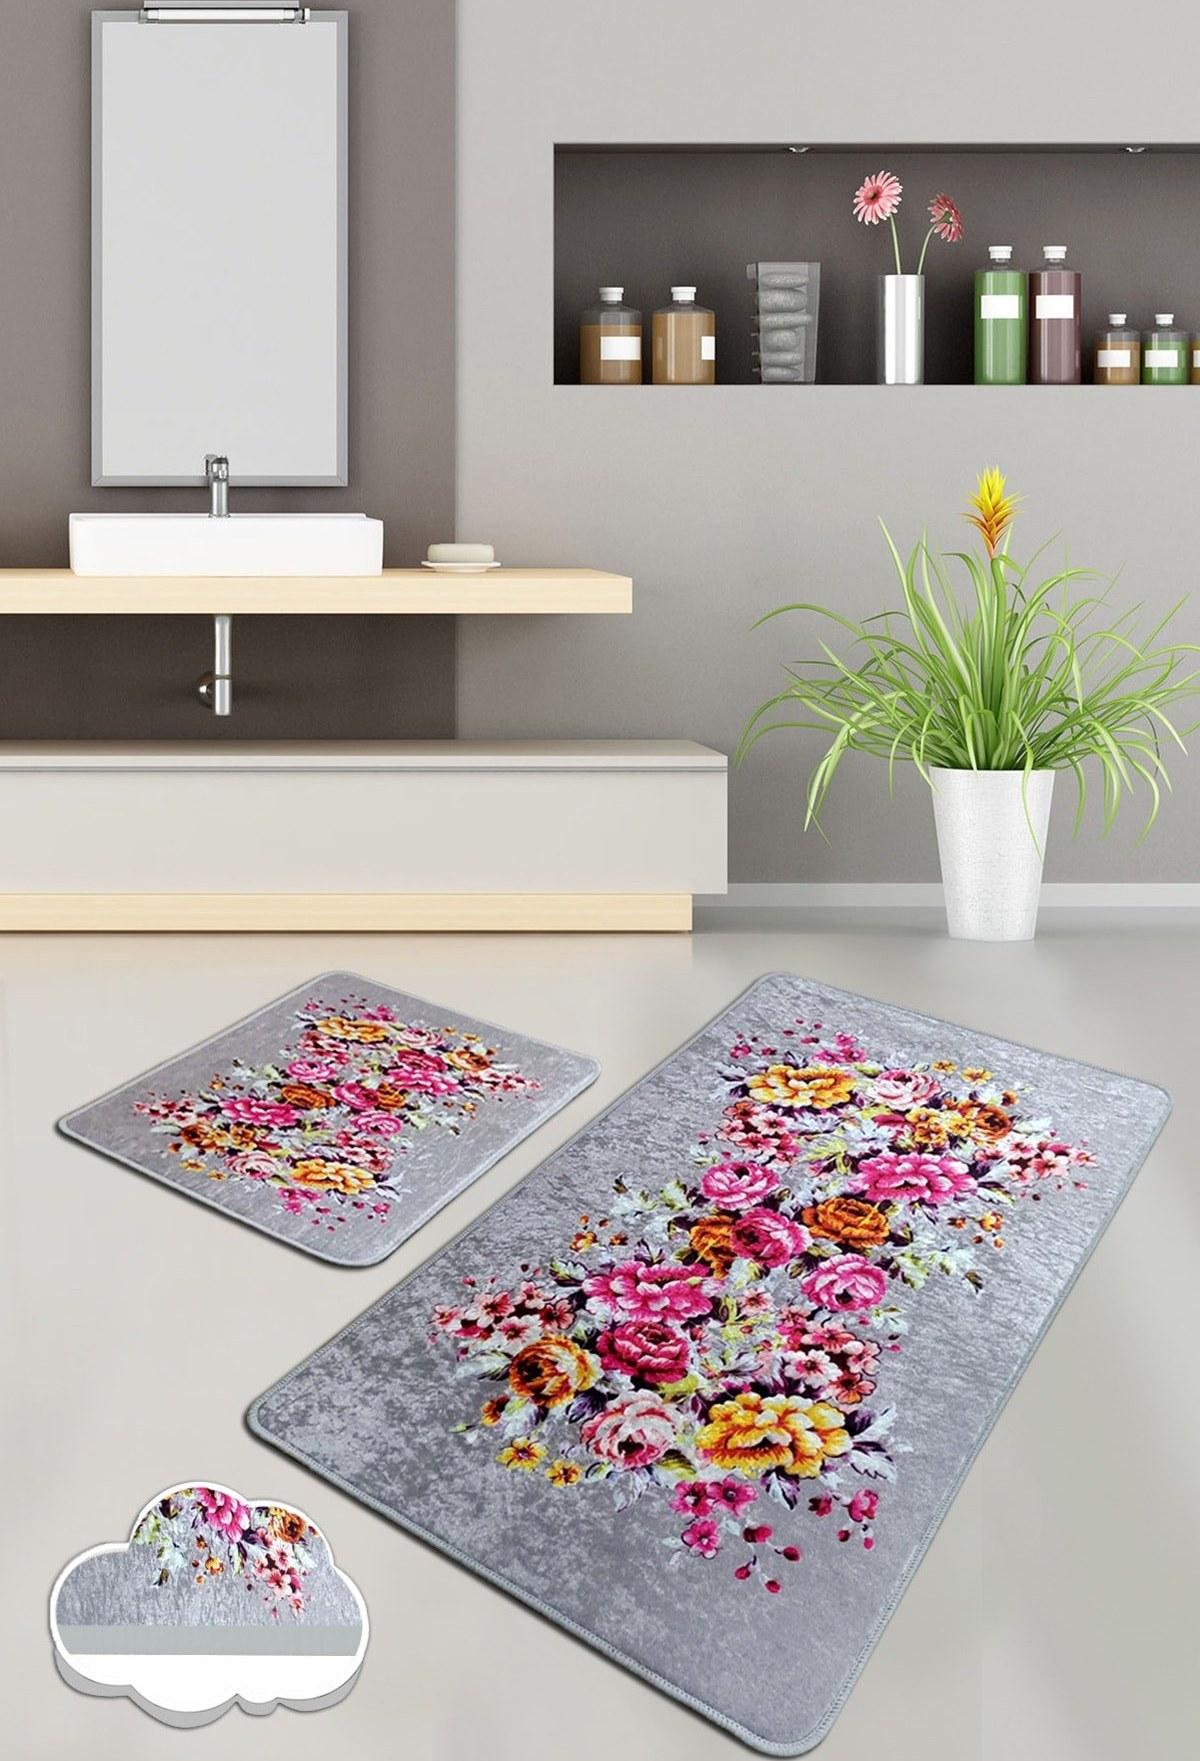 تصویر زیرپایی حمام فرش ست قابل شستشو کف لیز نمیخورد 2تکه برند Chilai Home کد 1617720573